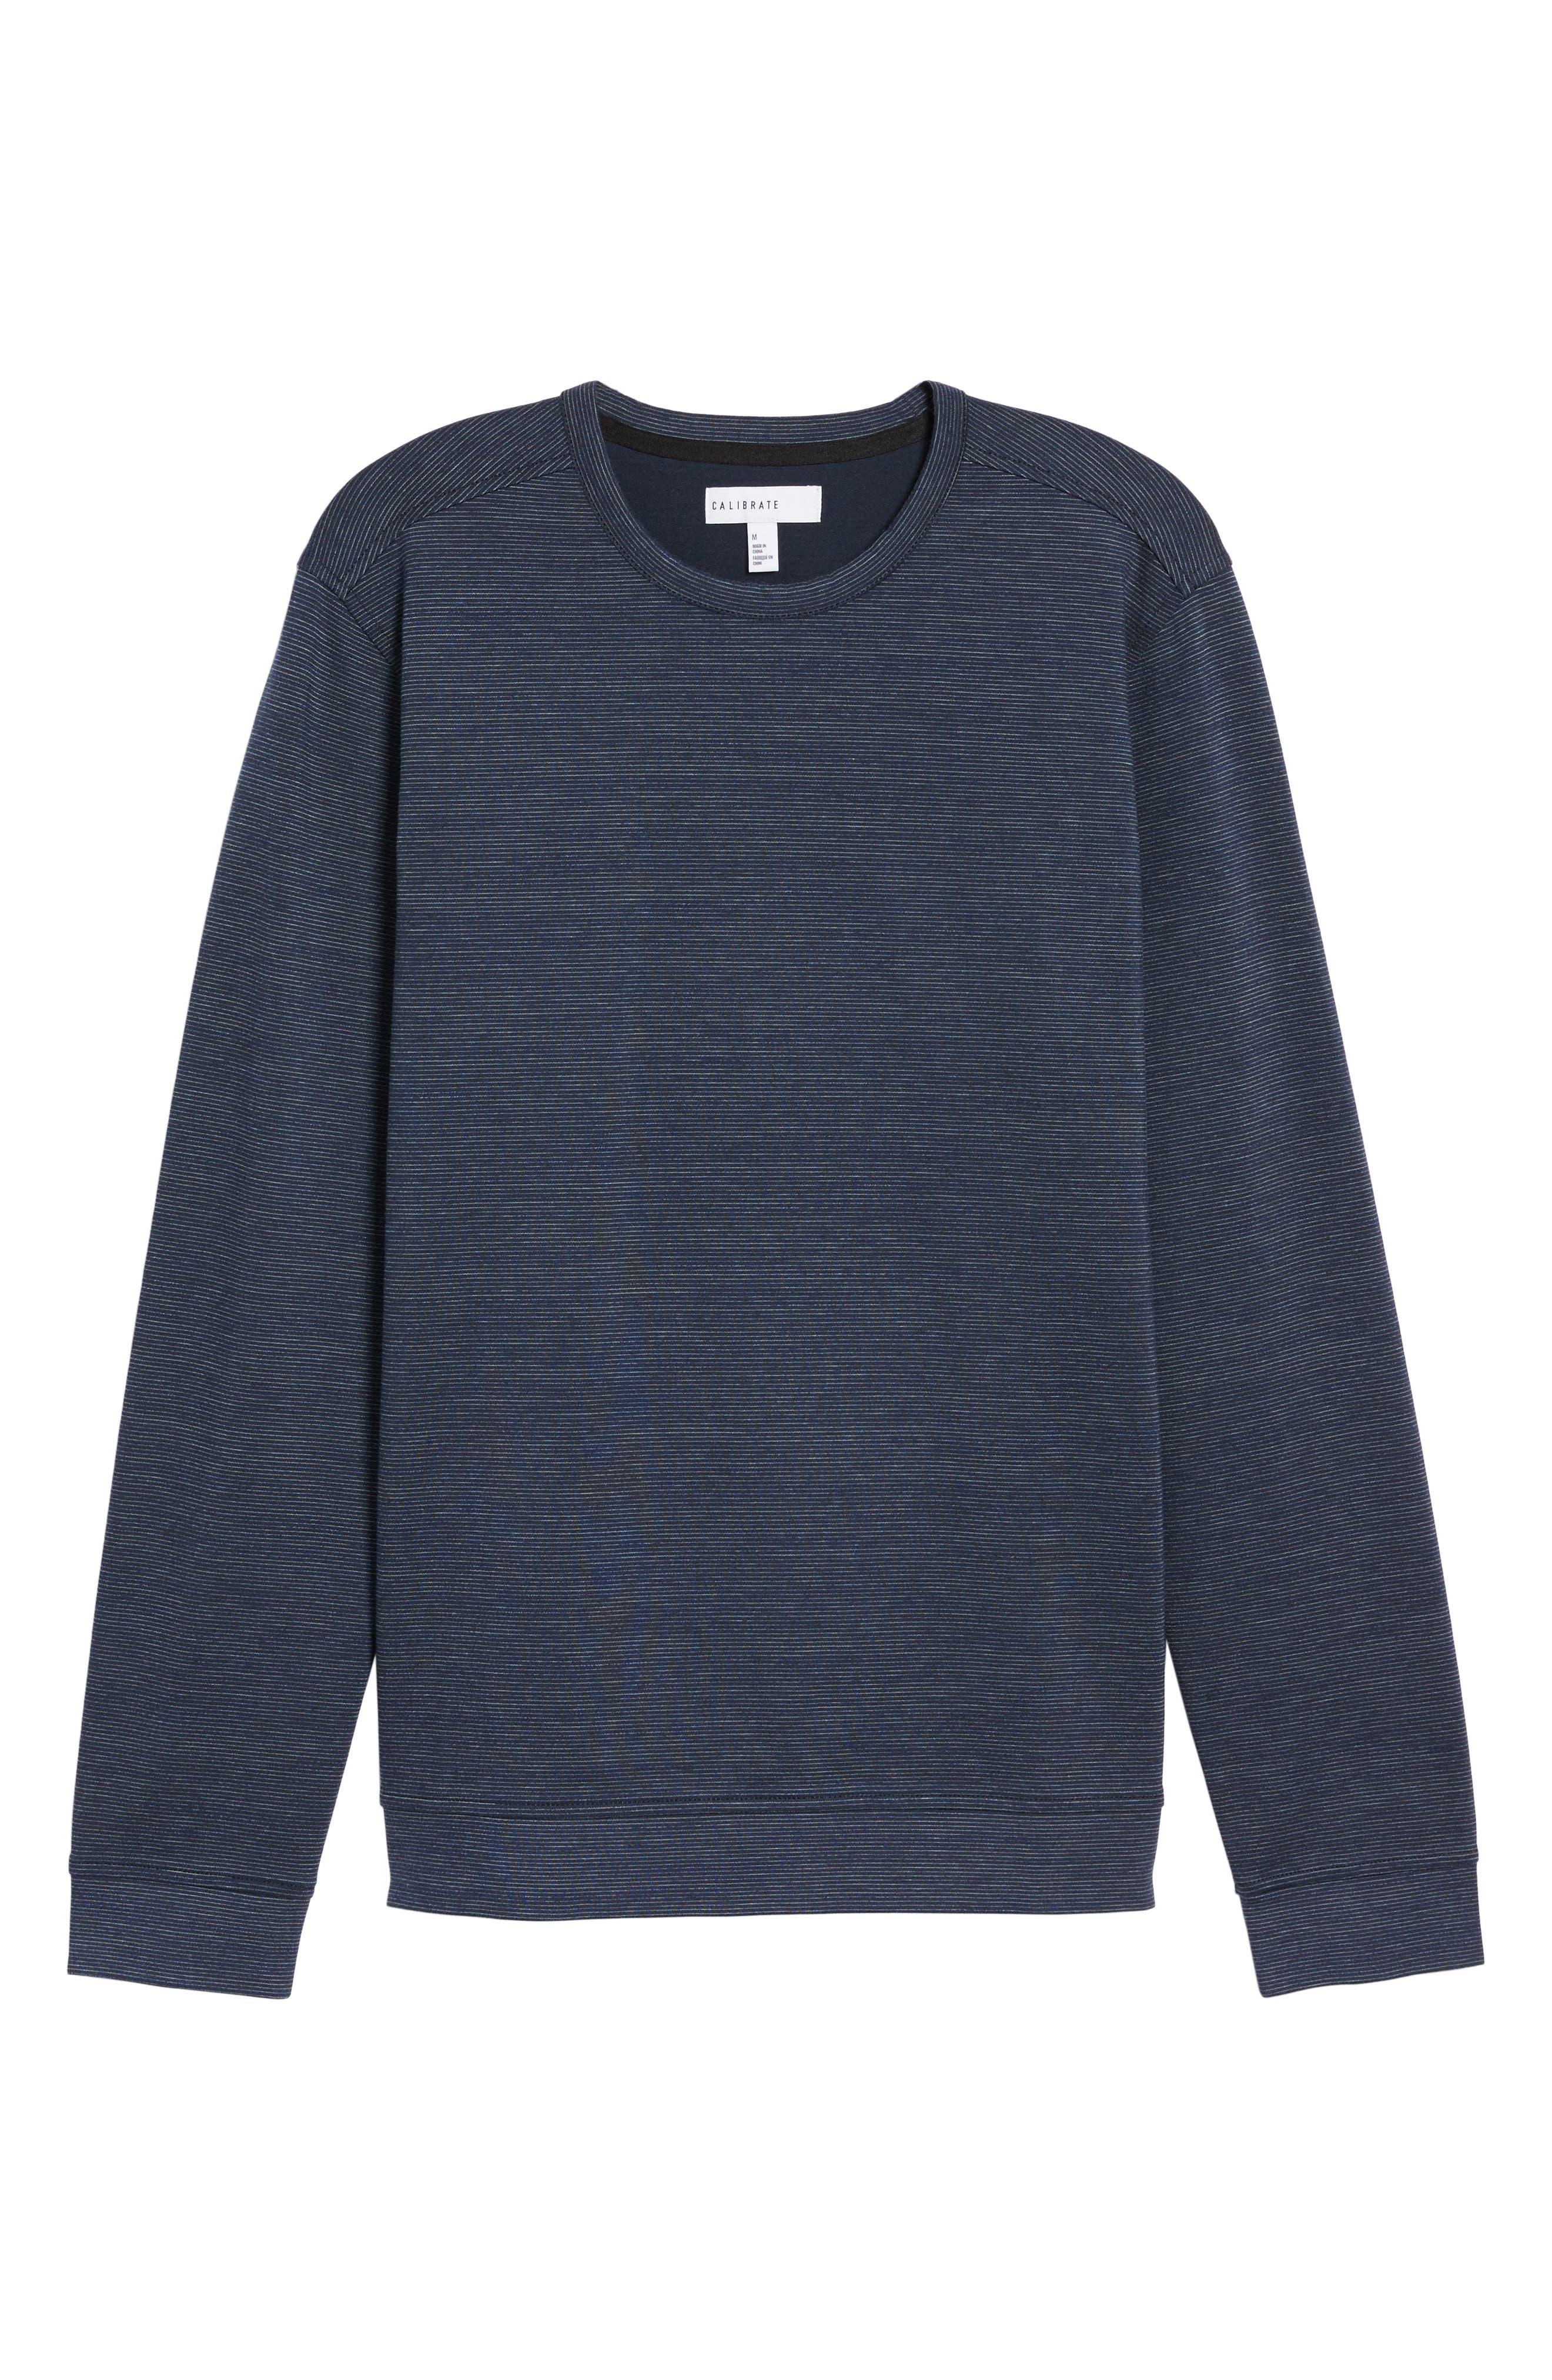 Space Dye Stripe Sweatshirt,                             Alternate thumbnail 6, color,                             Navy Night Spacedye